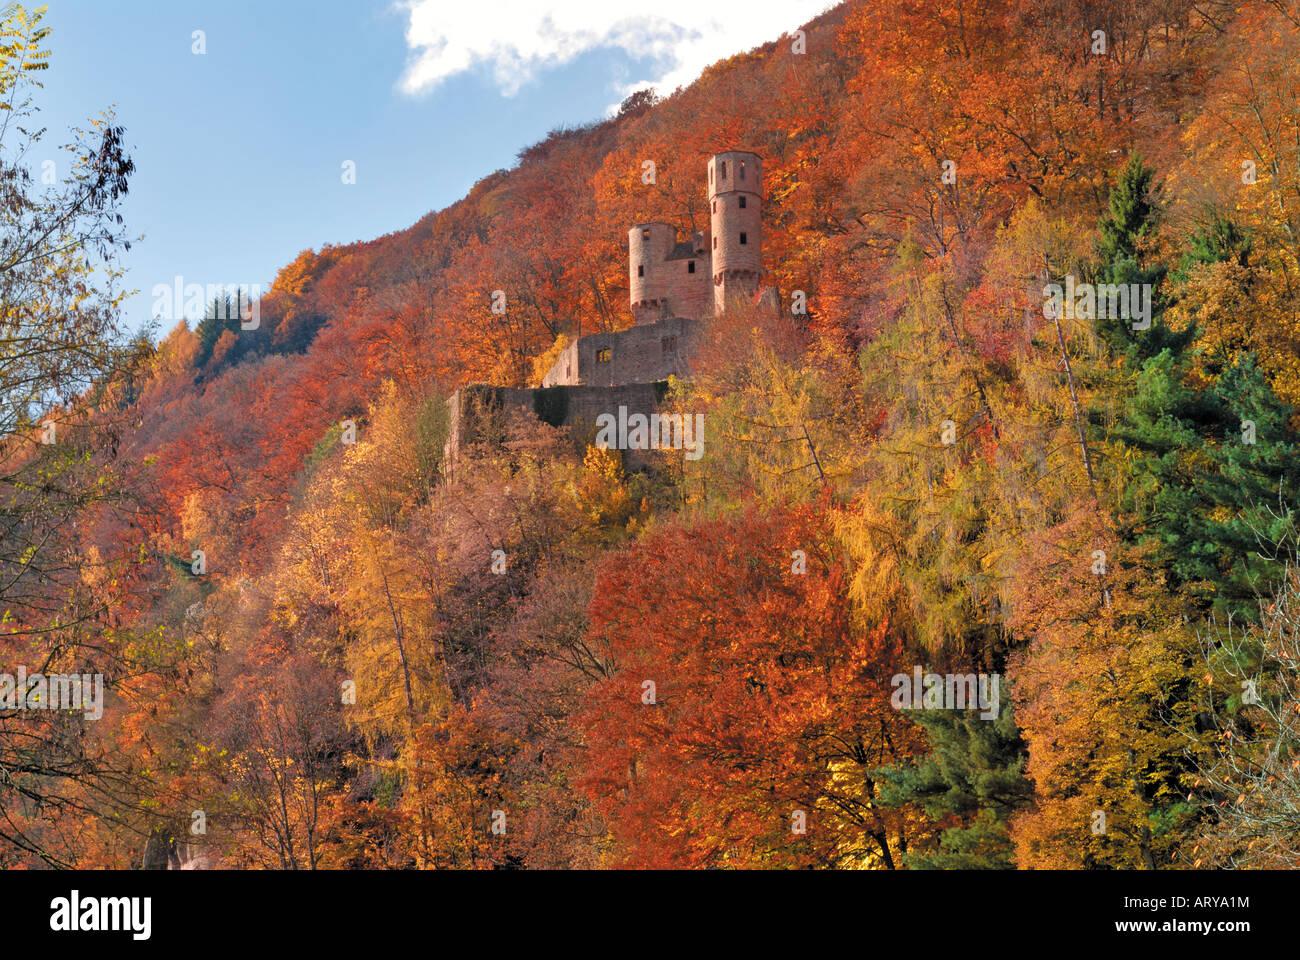 Castle Schadeck in Neckarsteinach, Hessen, Germany Stock Photo